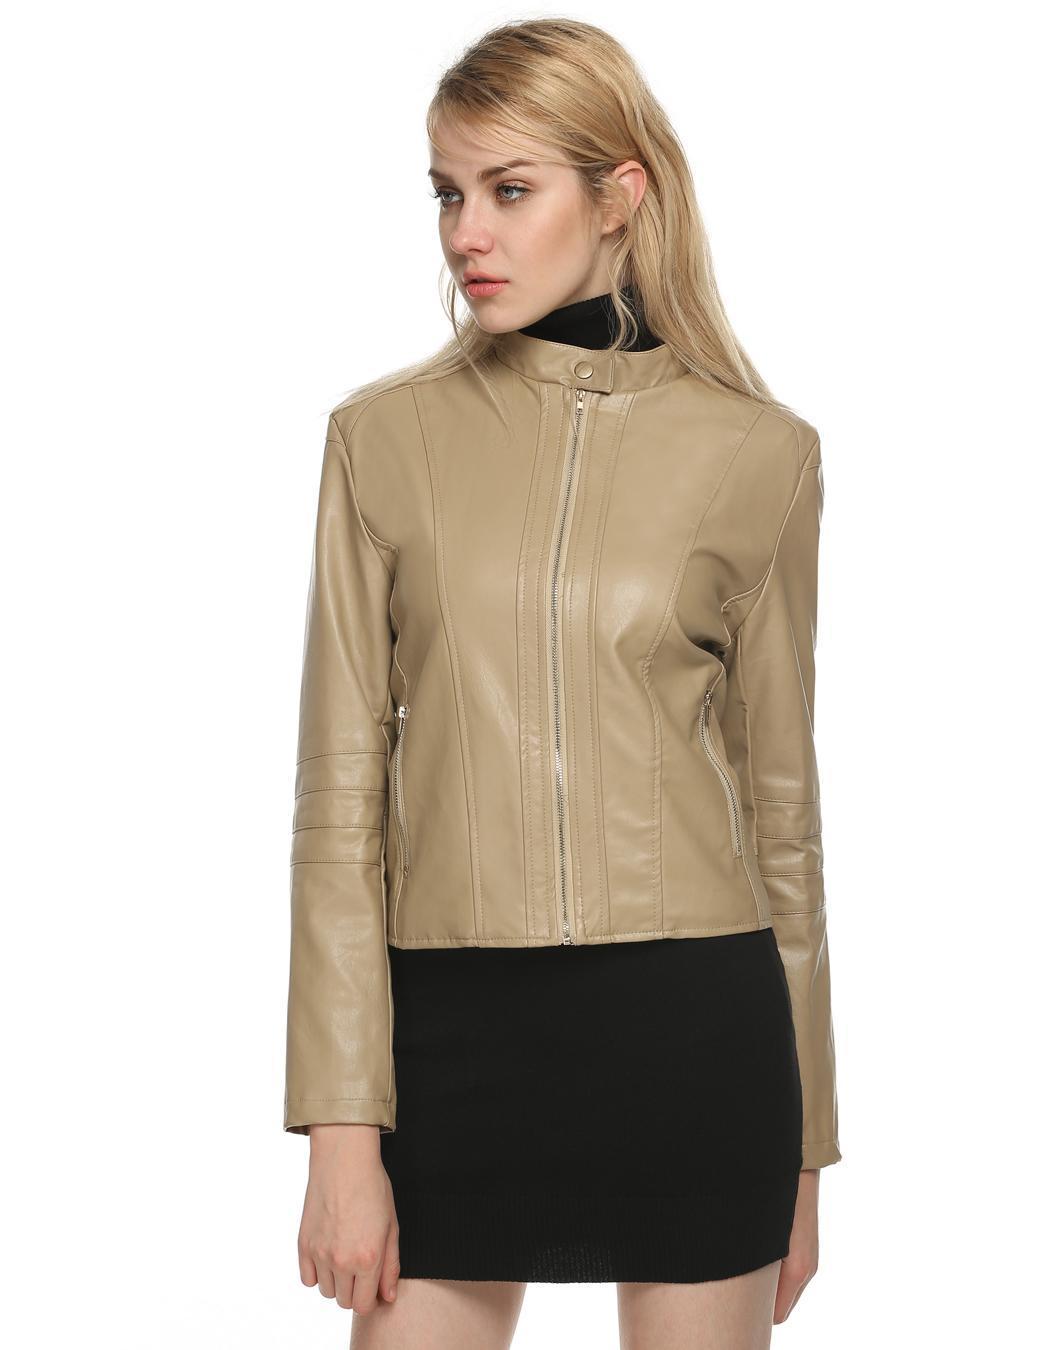 Women Long Sleeve Synthetic Leather Casual Bike Jacket Short Coat 2